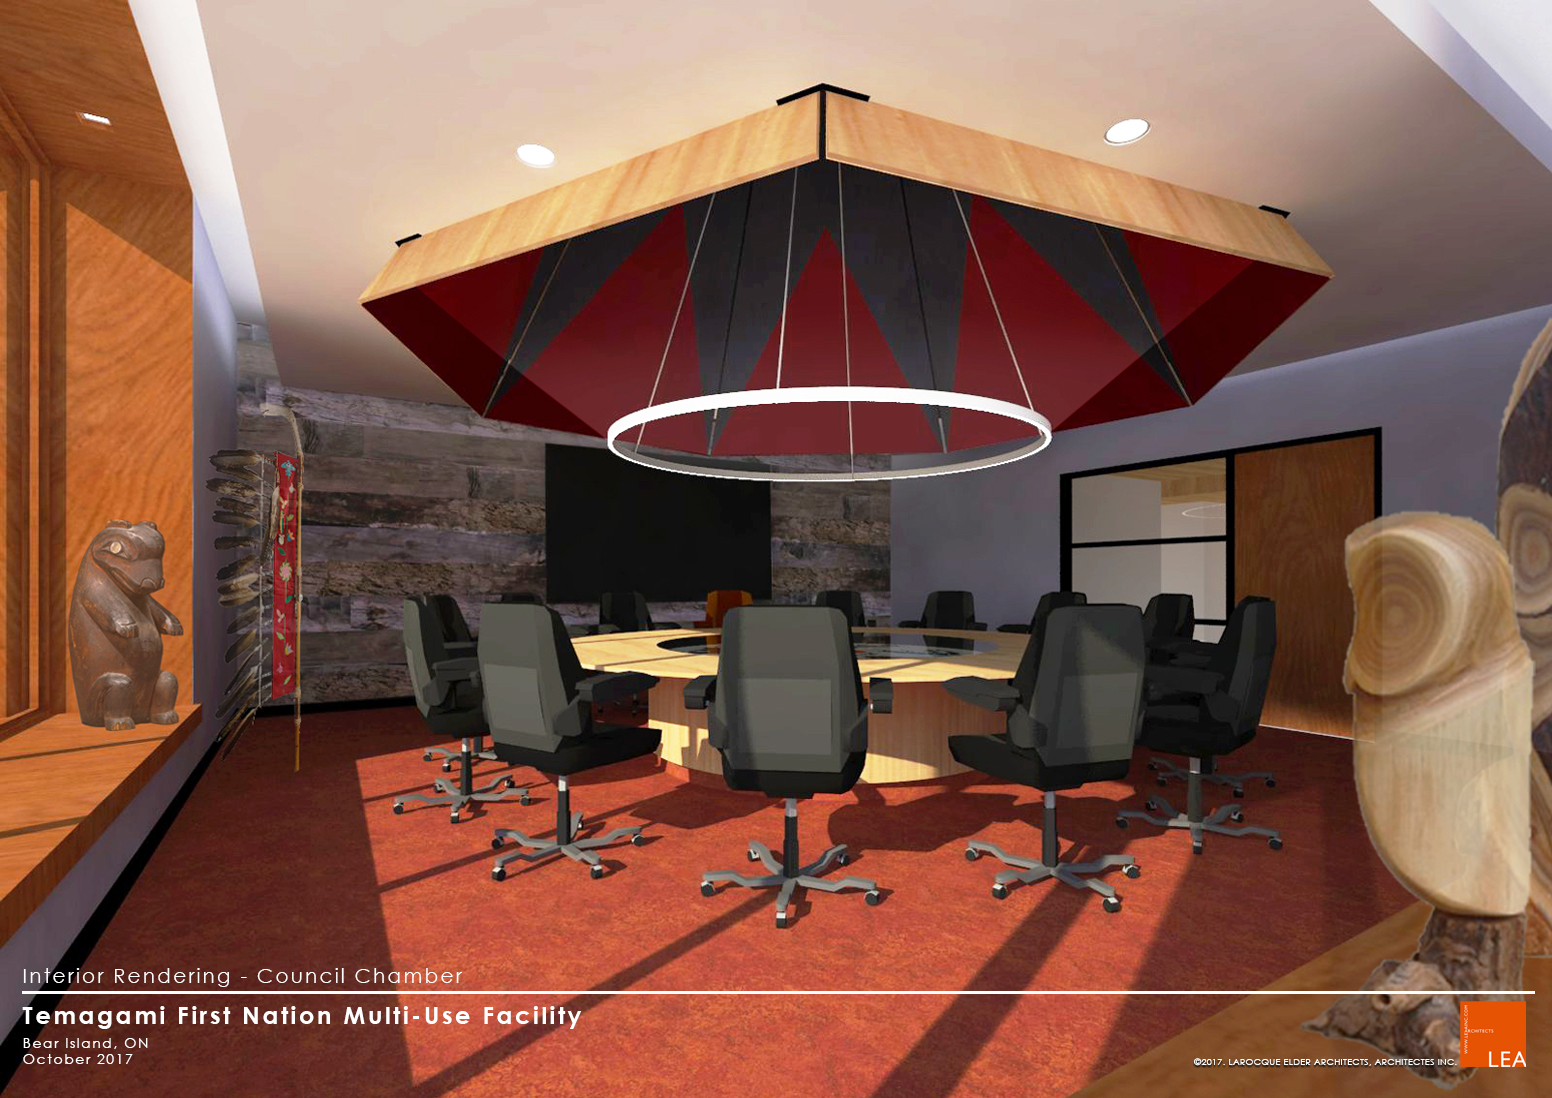 16058 171013 Council Chamber - 7 panels.jpg